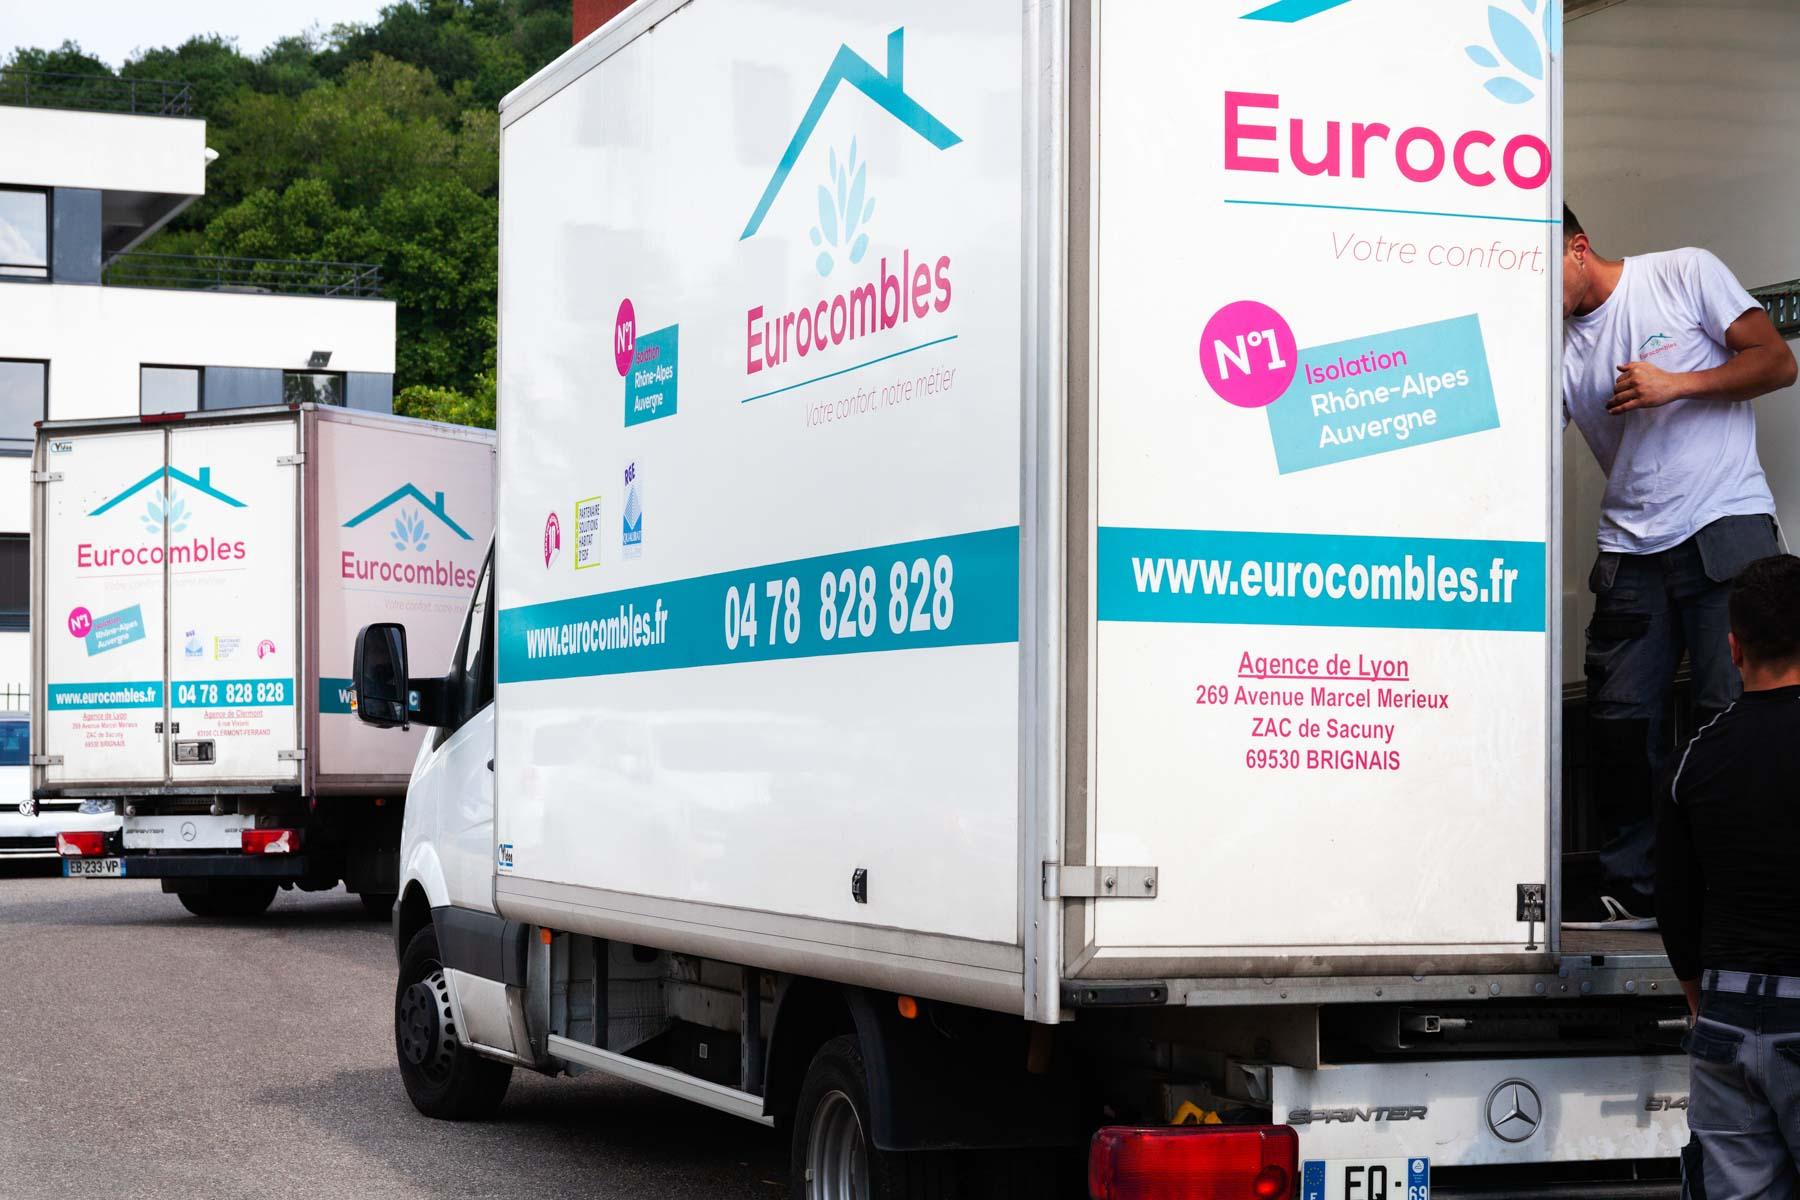 Reportage photo corporate Eurocombles photo reportage entreprise Karine A. Photographie15 - Reportage photo professionnel - Eurocombles